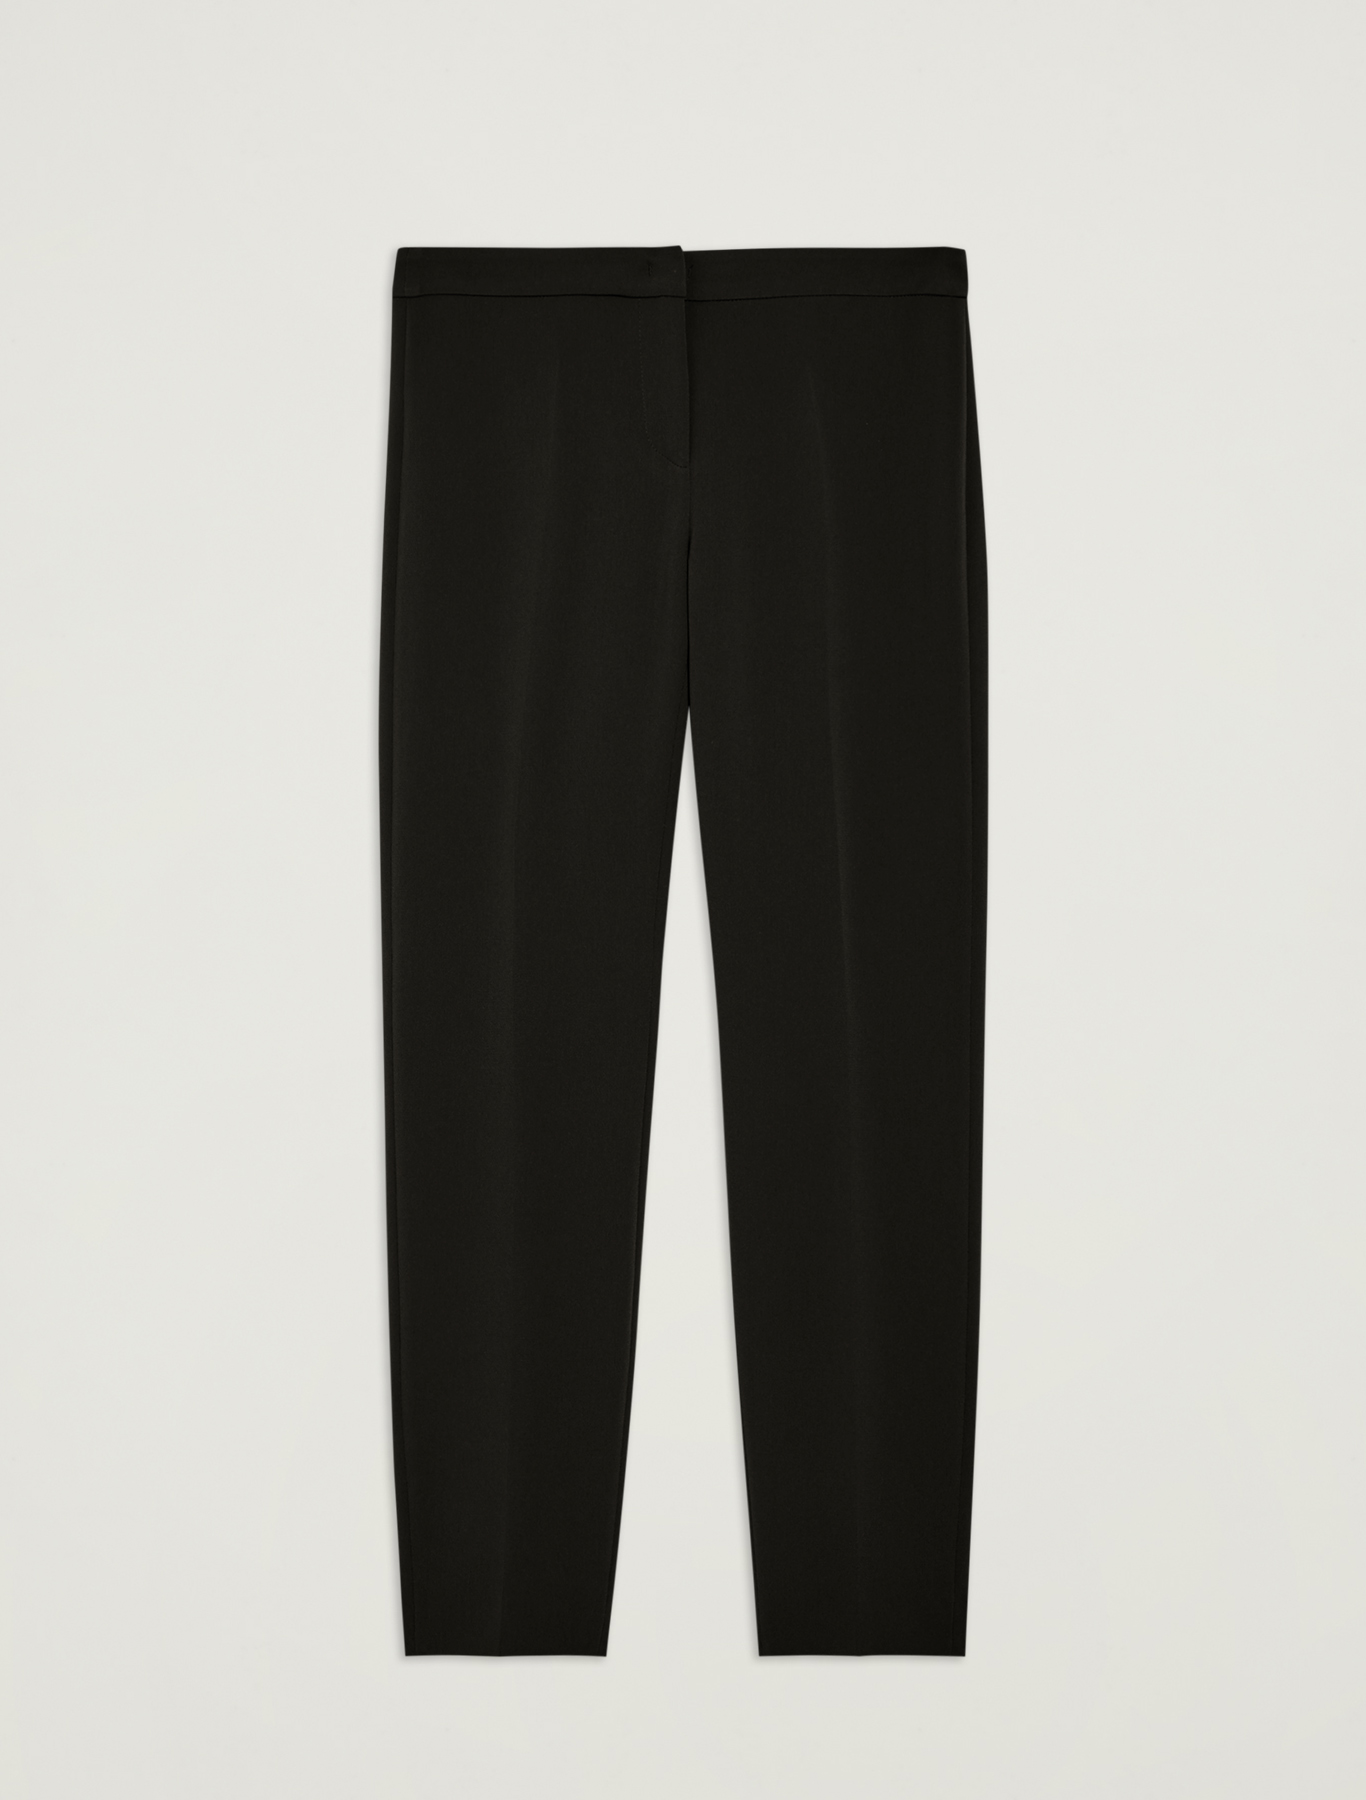 Slim fit fluid trousers - black - pennyblack